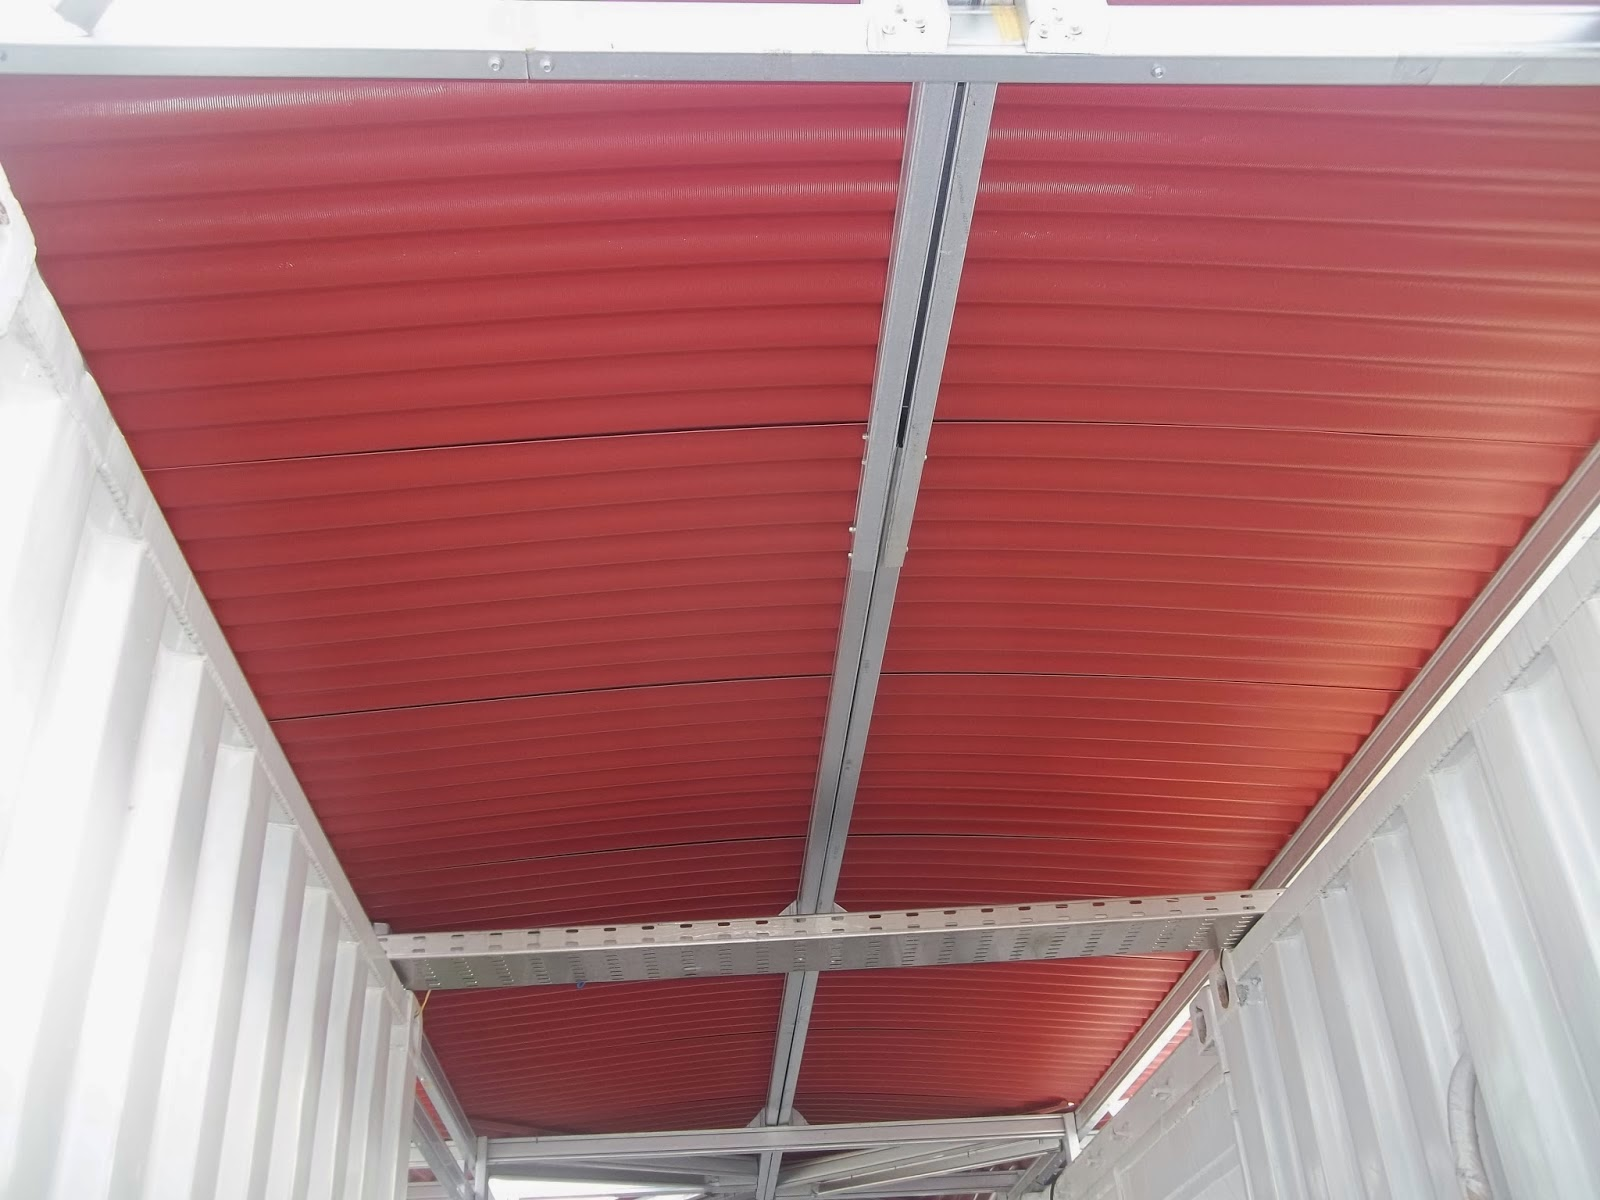 harga atap baja ringan asbes canopy tangerang tentang